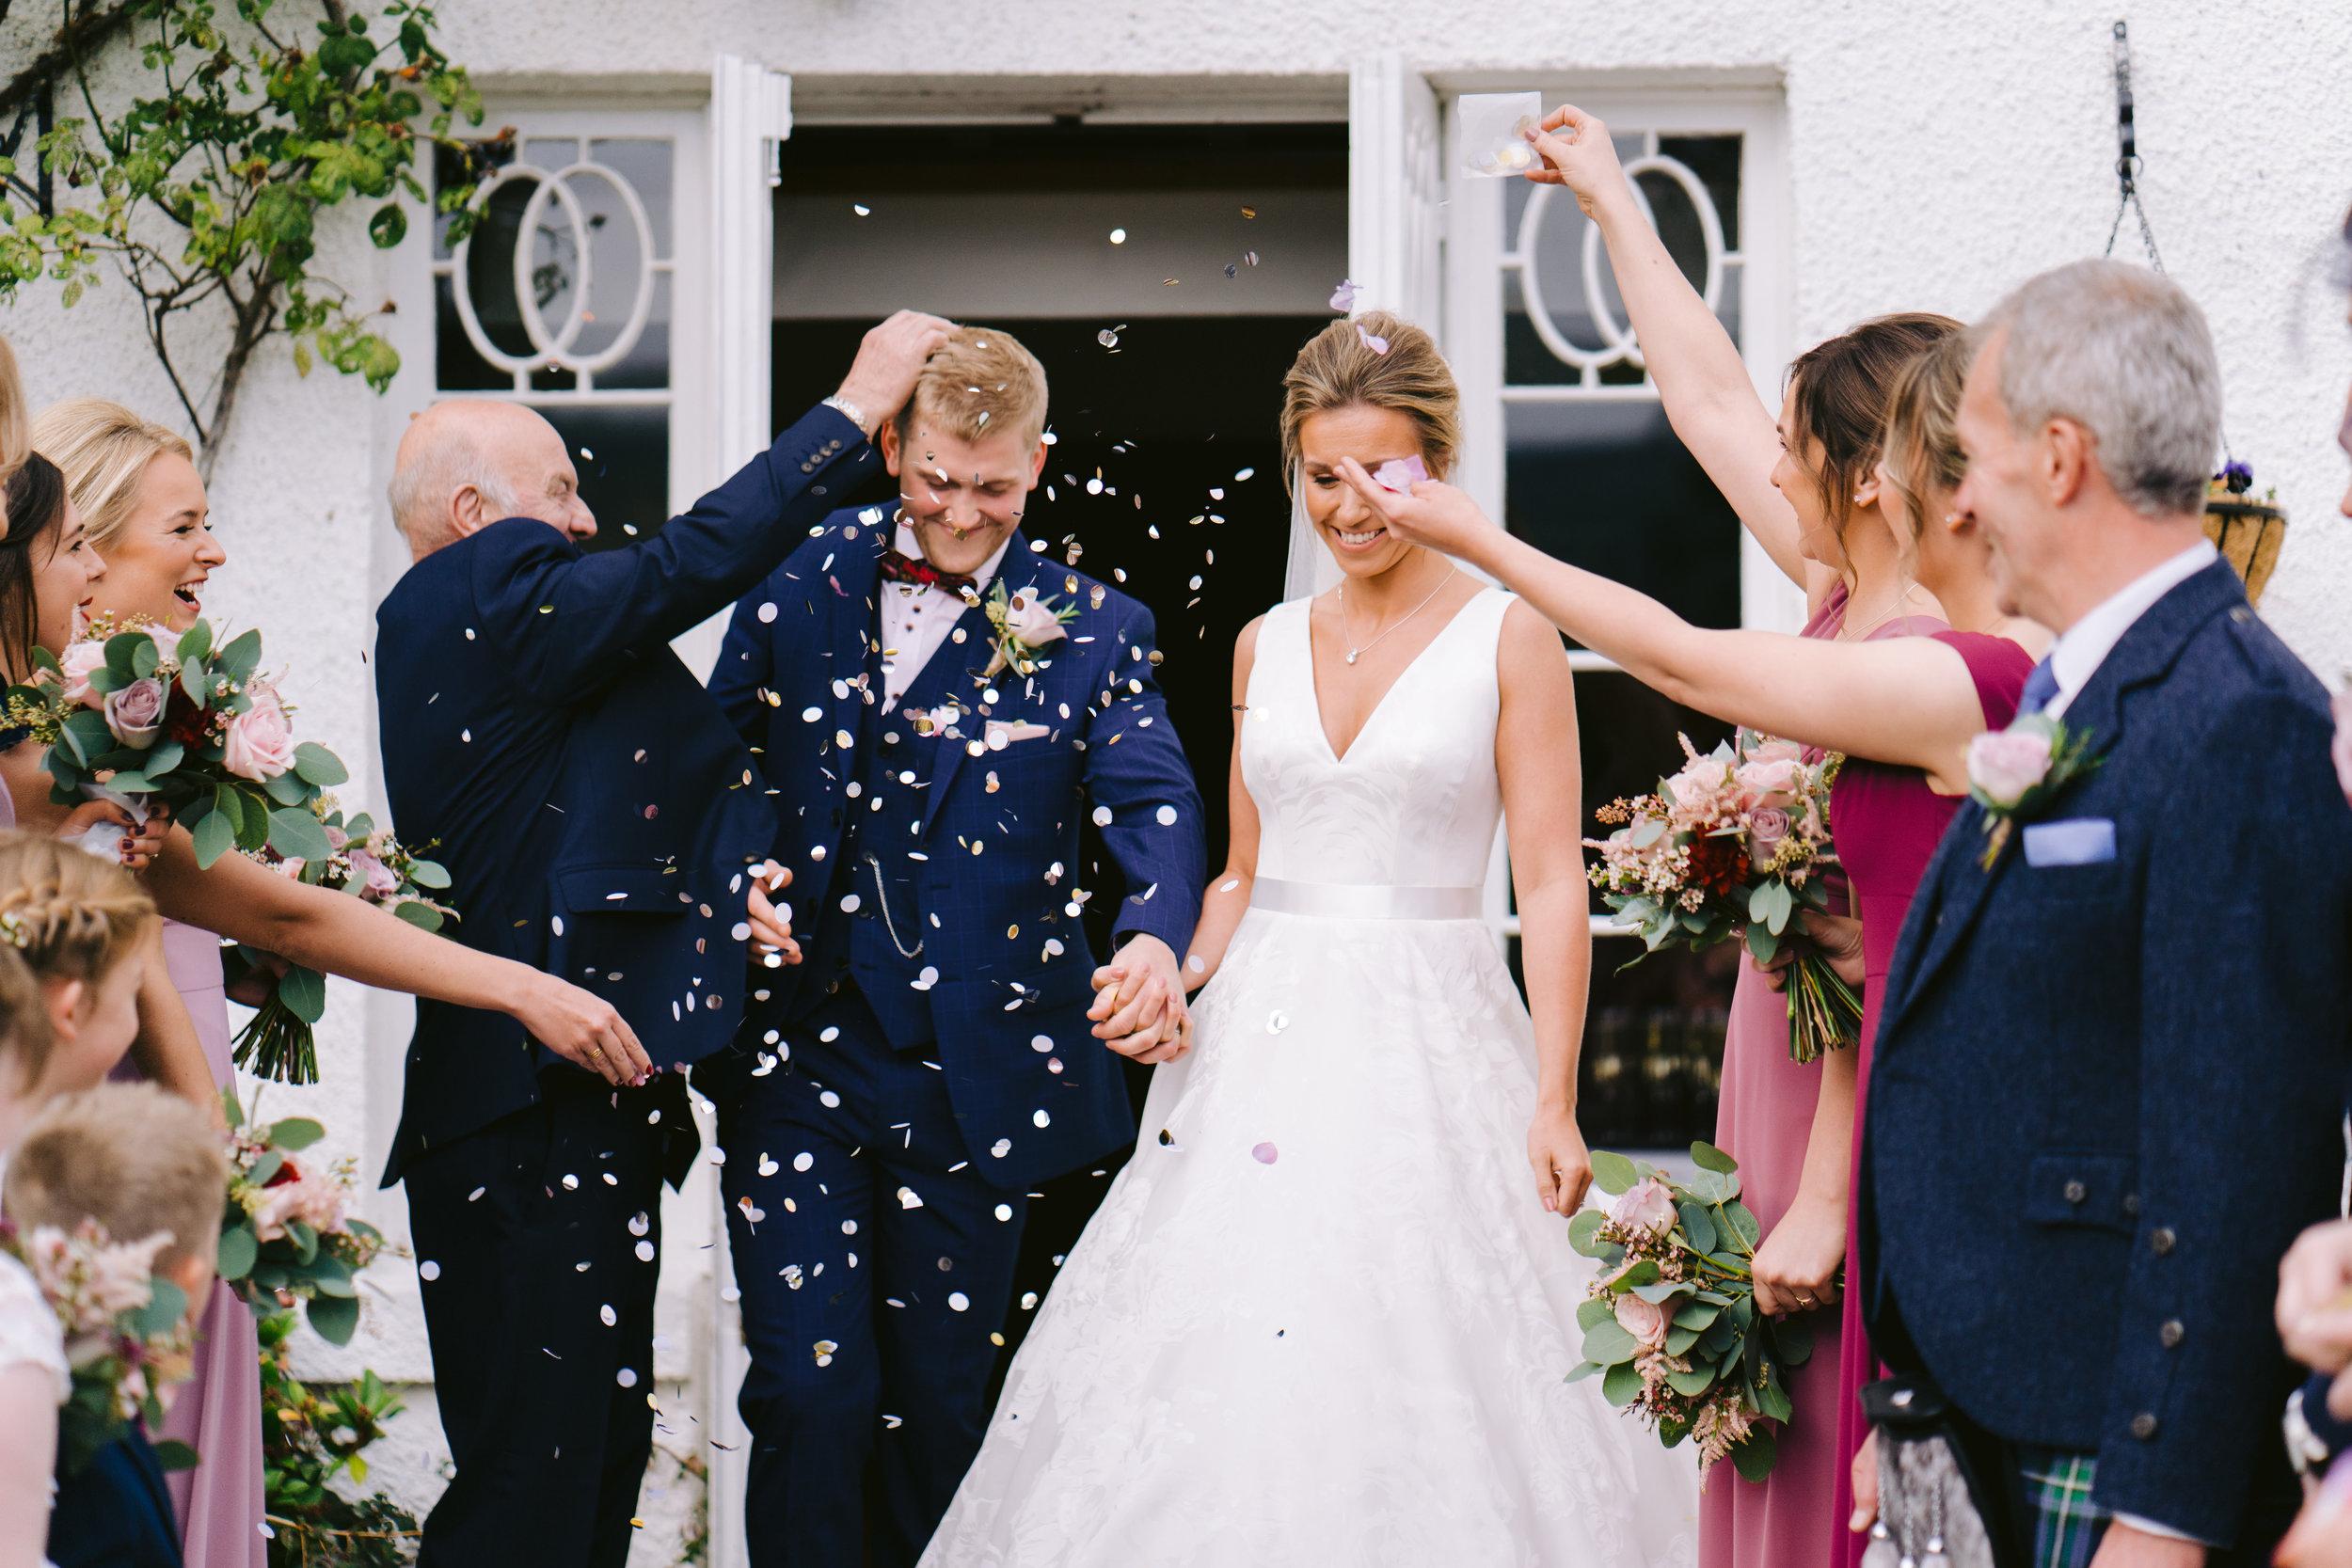 Karin_and_Shauns_Wedding_-_Achnagairn_Castle_-_www.eilidhrobertson.co.uk-584.jpg